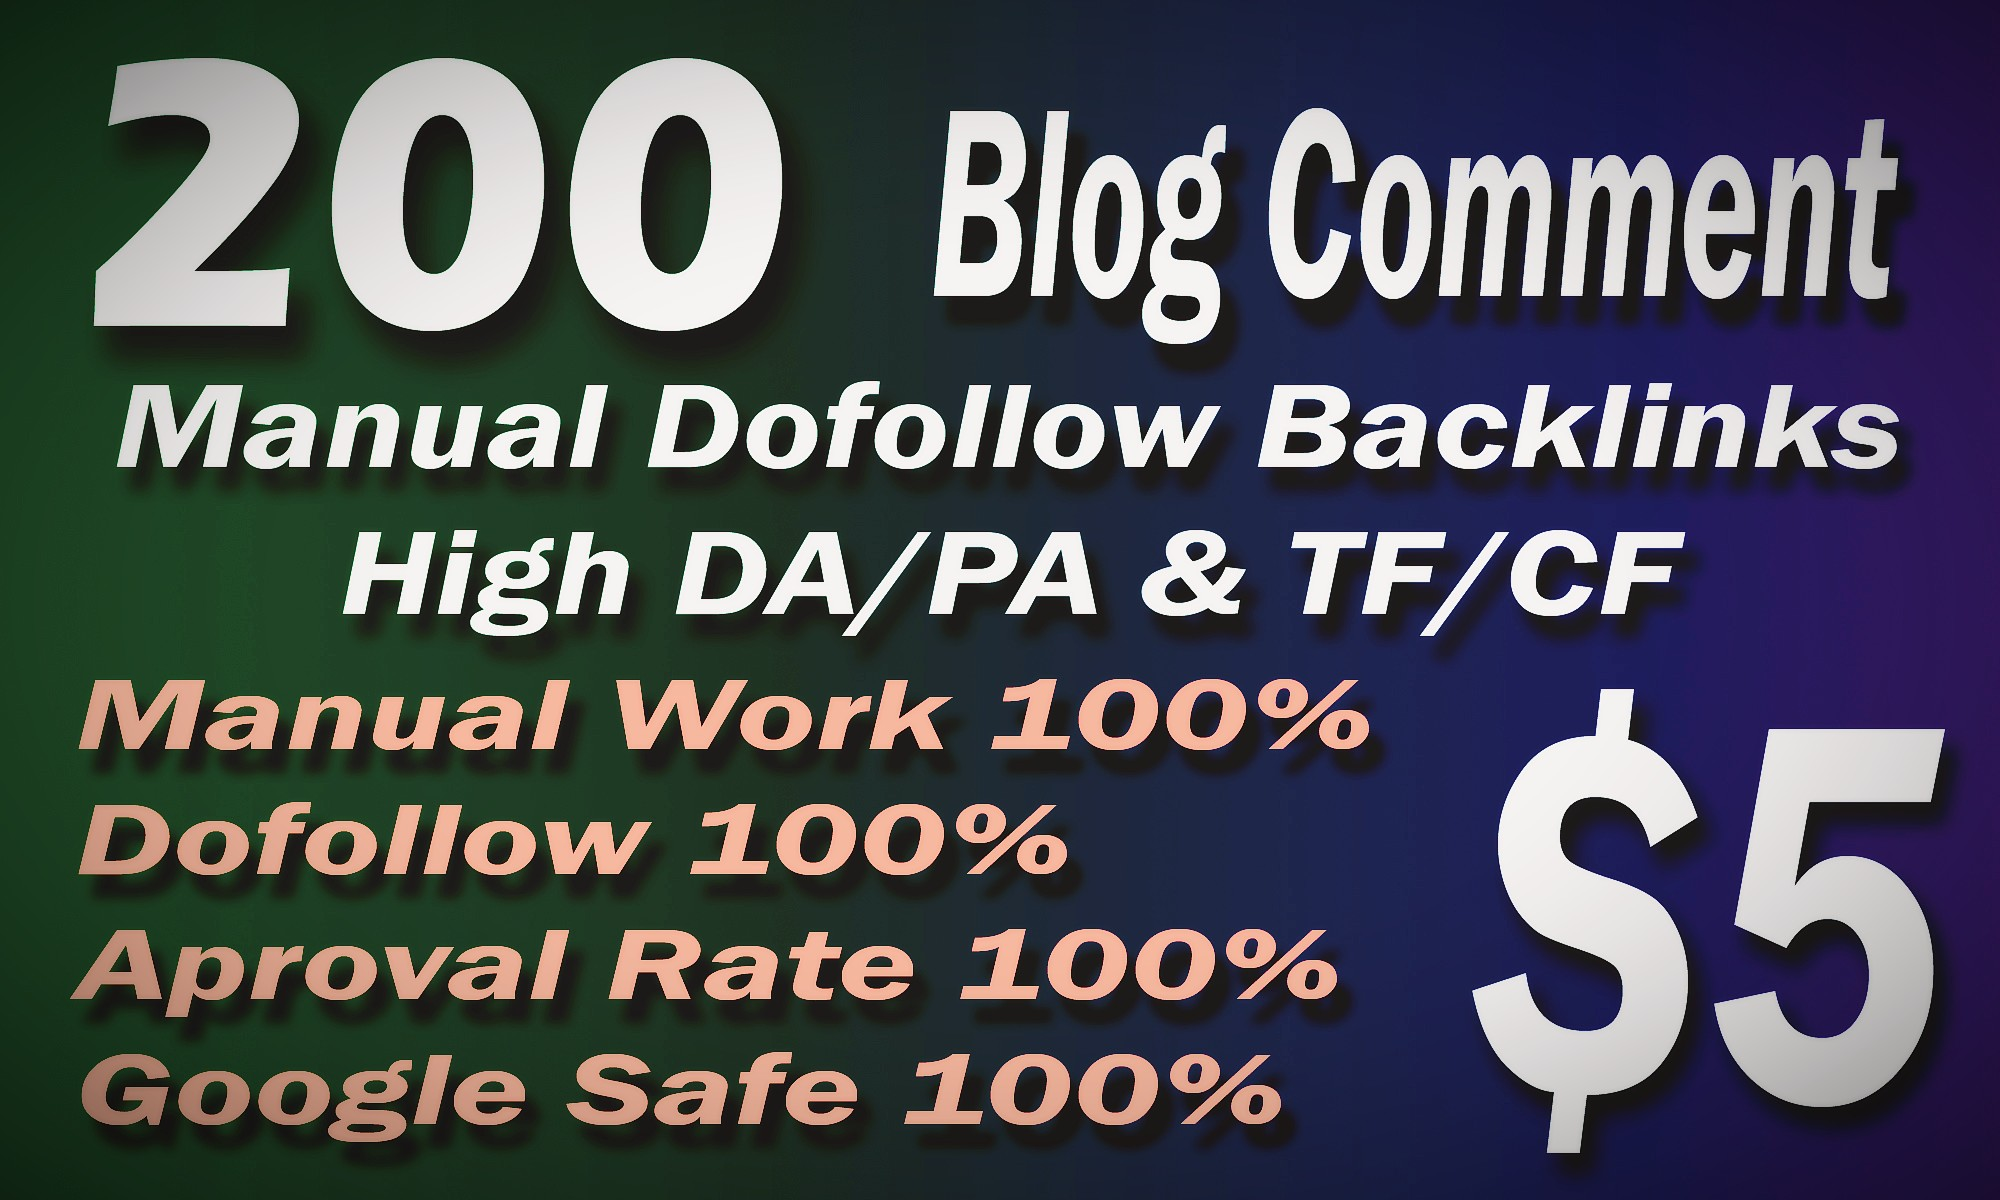 Manual Dofollow 200 Blog comment Low OBL Backlinks on High DA sites